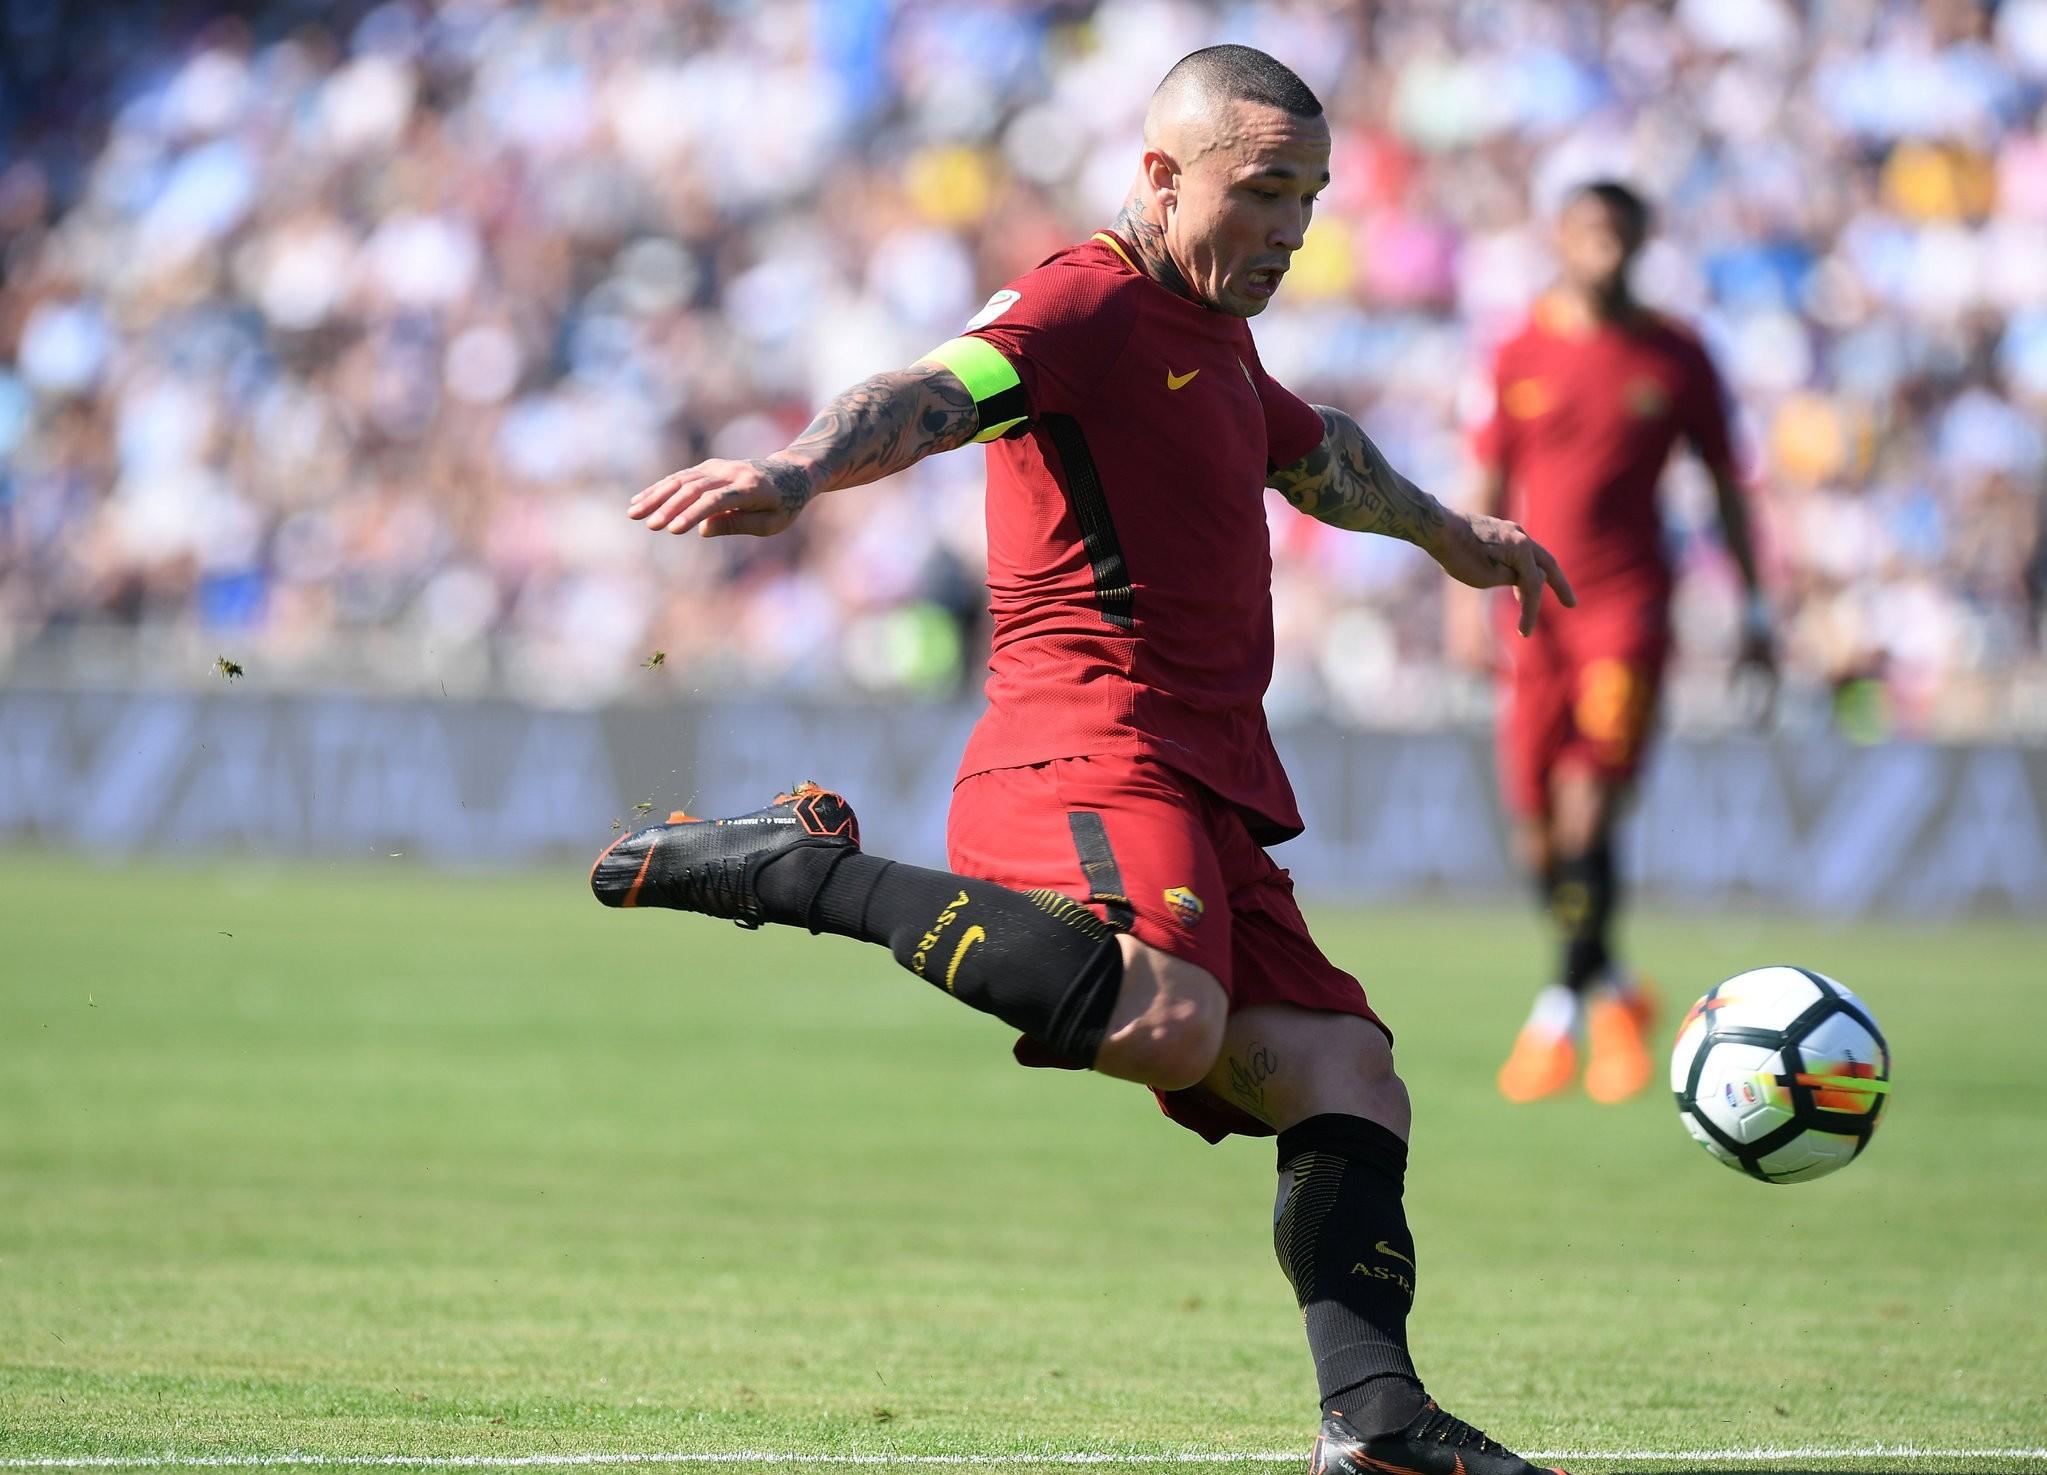 Roma's Radja Nainggolan scores their second goal on April 21, 2018. (Reuters Photo)